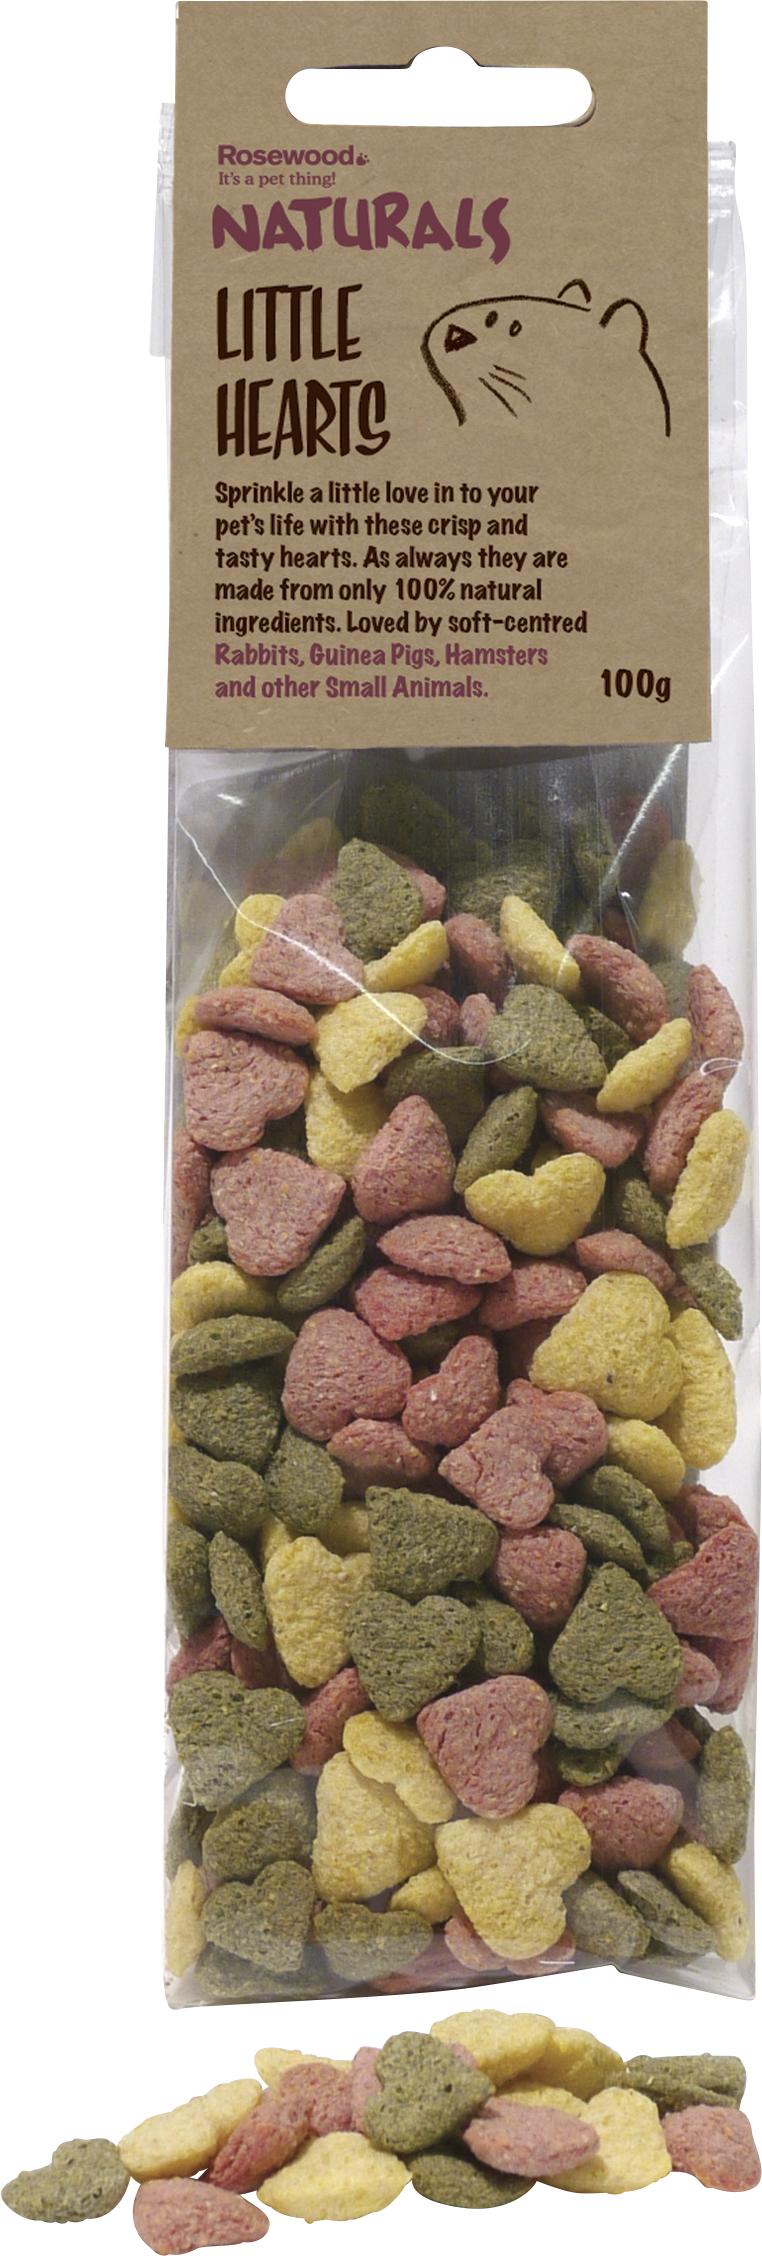 Gnagargodis Rosewood Små hjärtan, 100 g